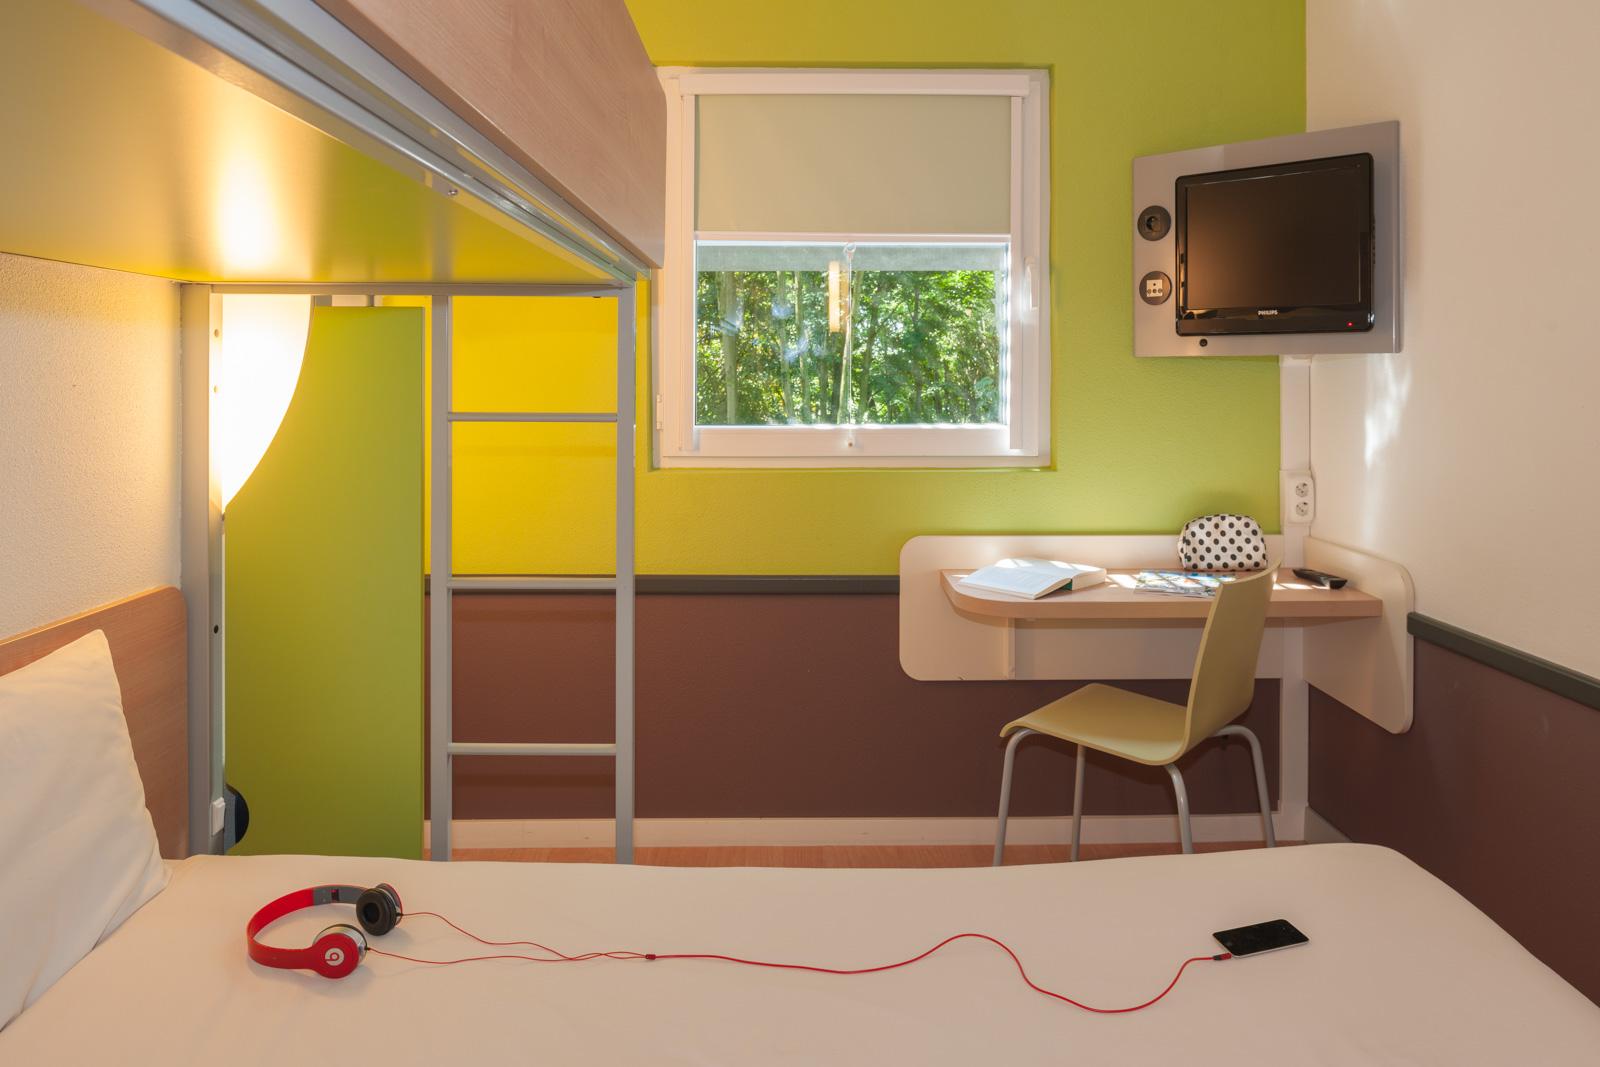 interieurfotograaf – Media-Tags – Architectuur fotograaf Dirk ...